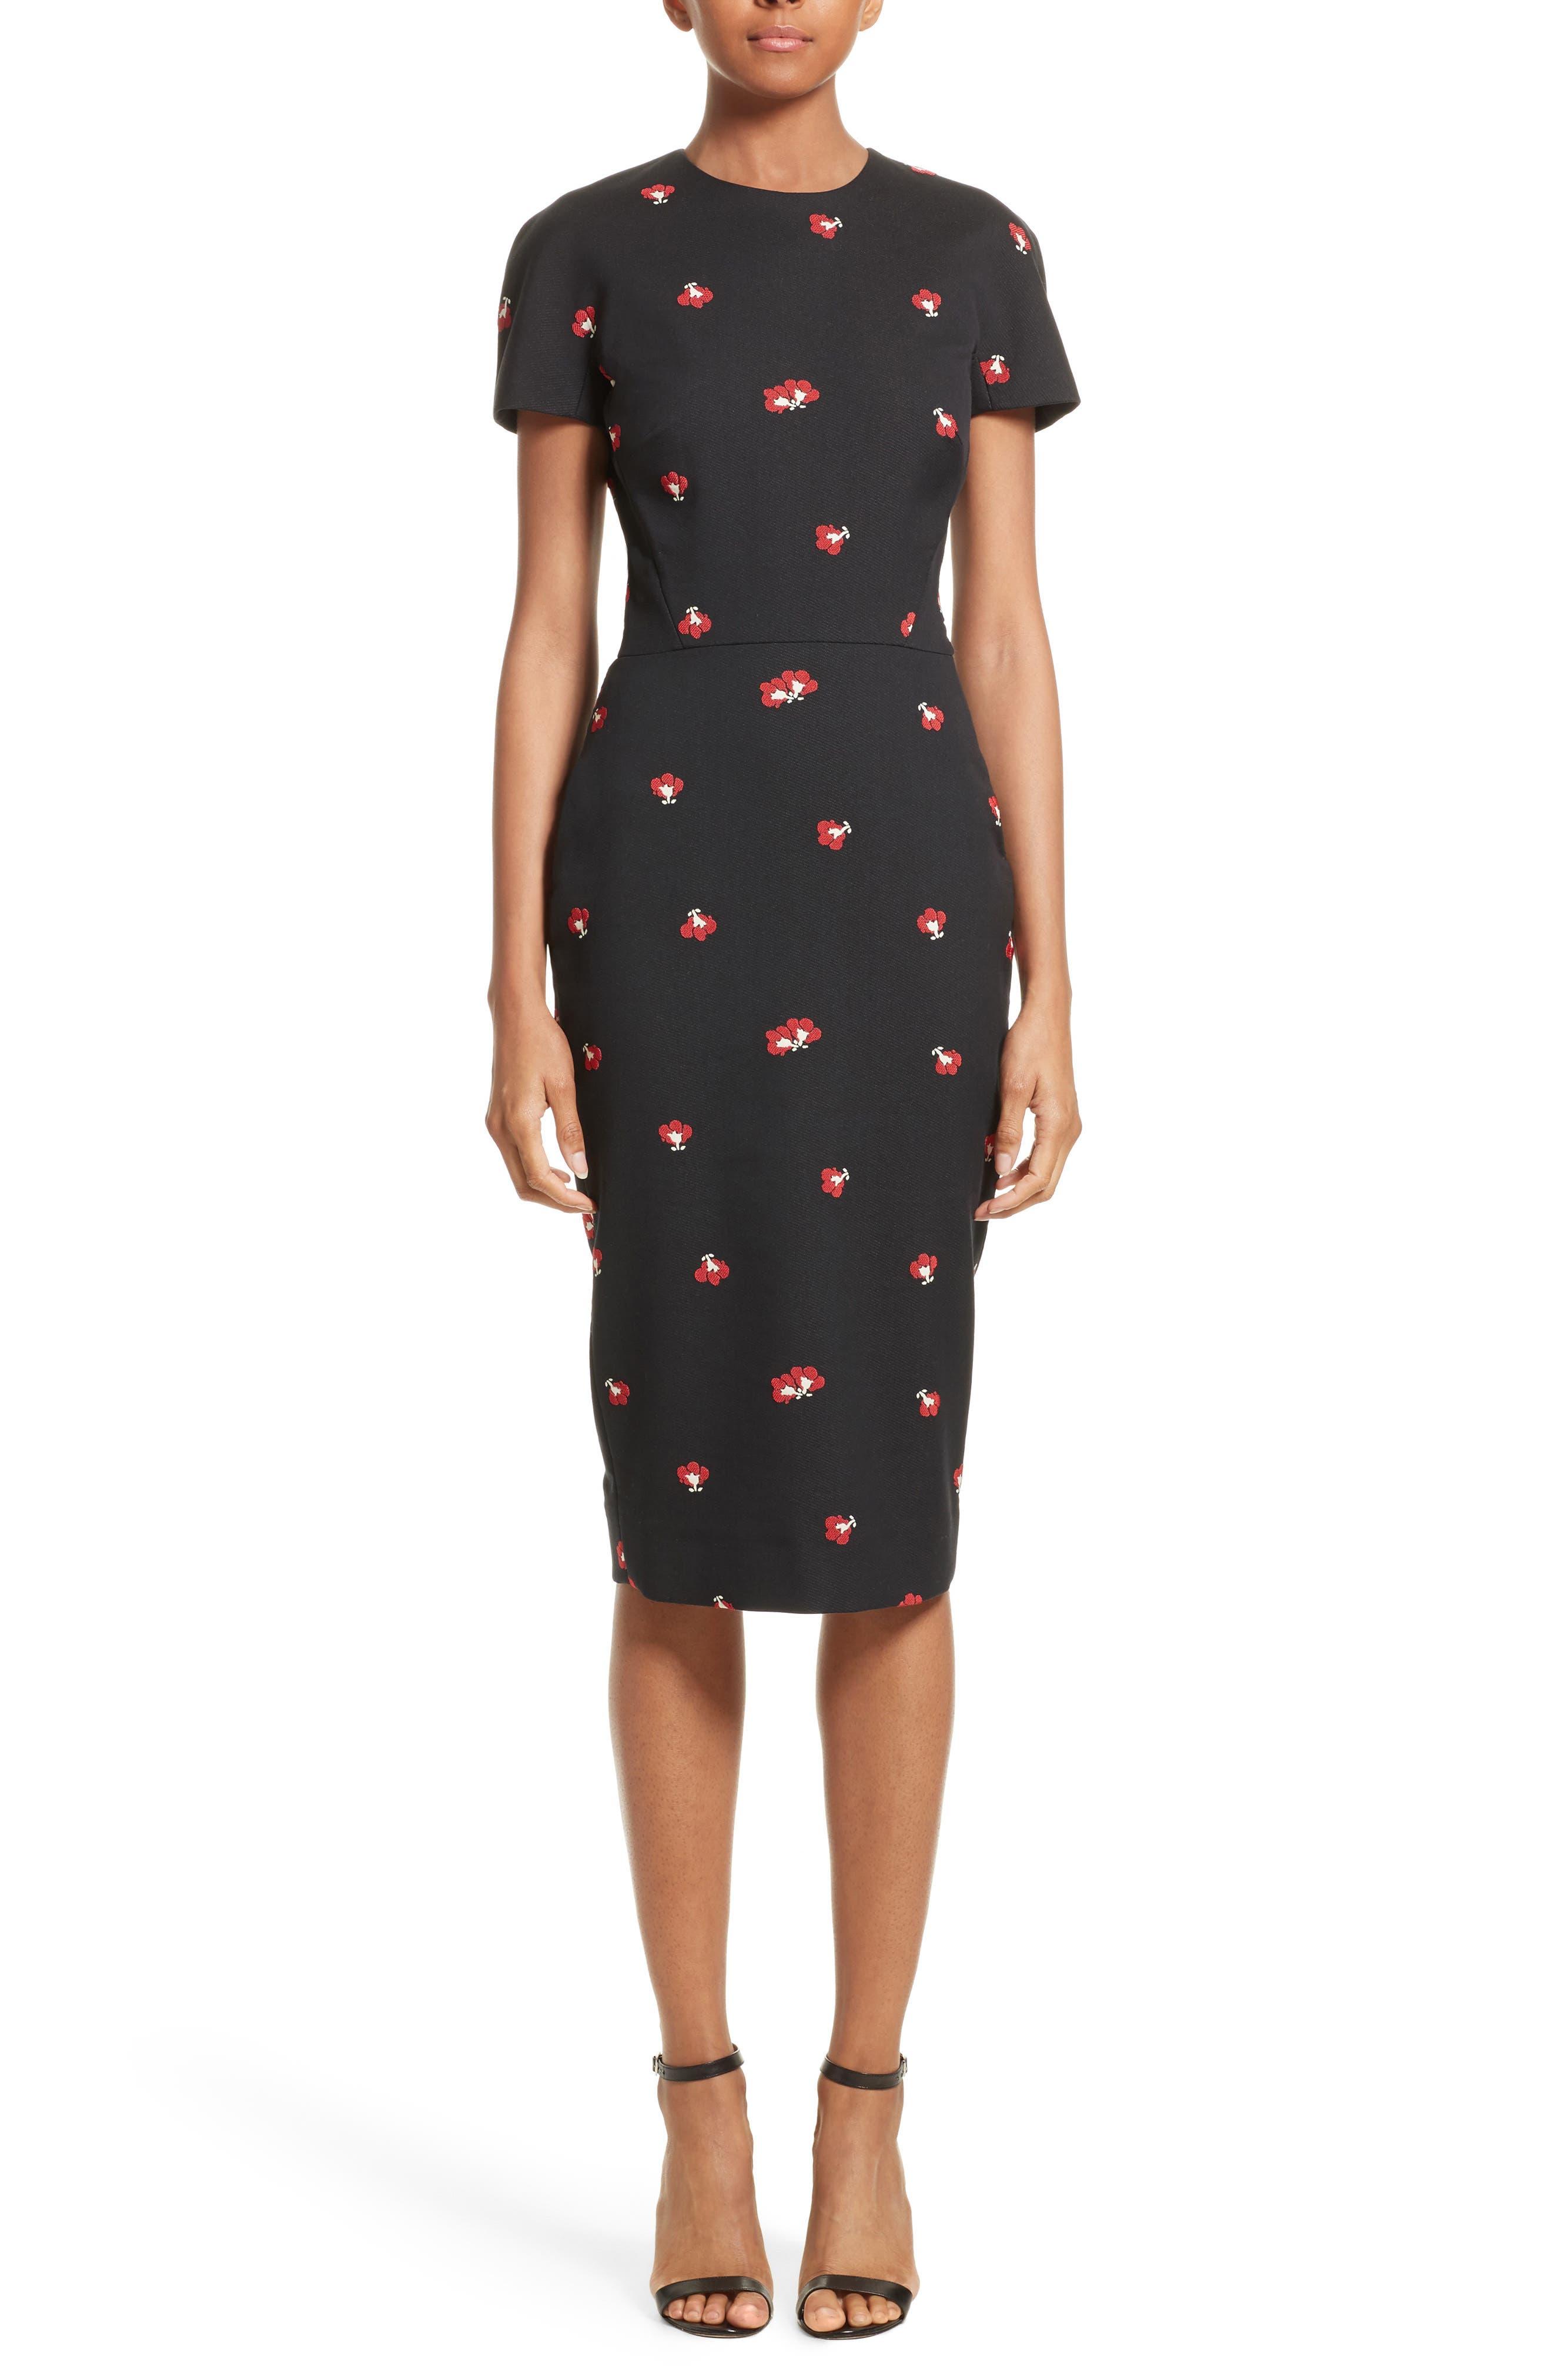 Flower Print Pencil Dress,                         Main,                         color, Black/ Red